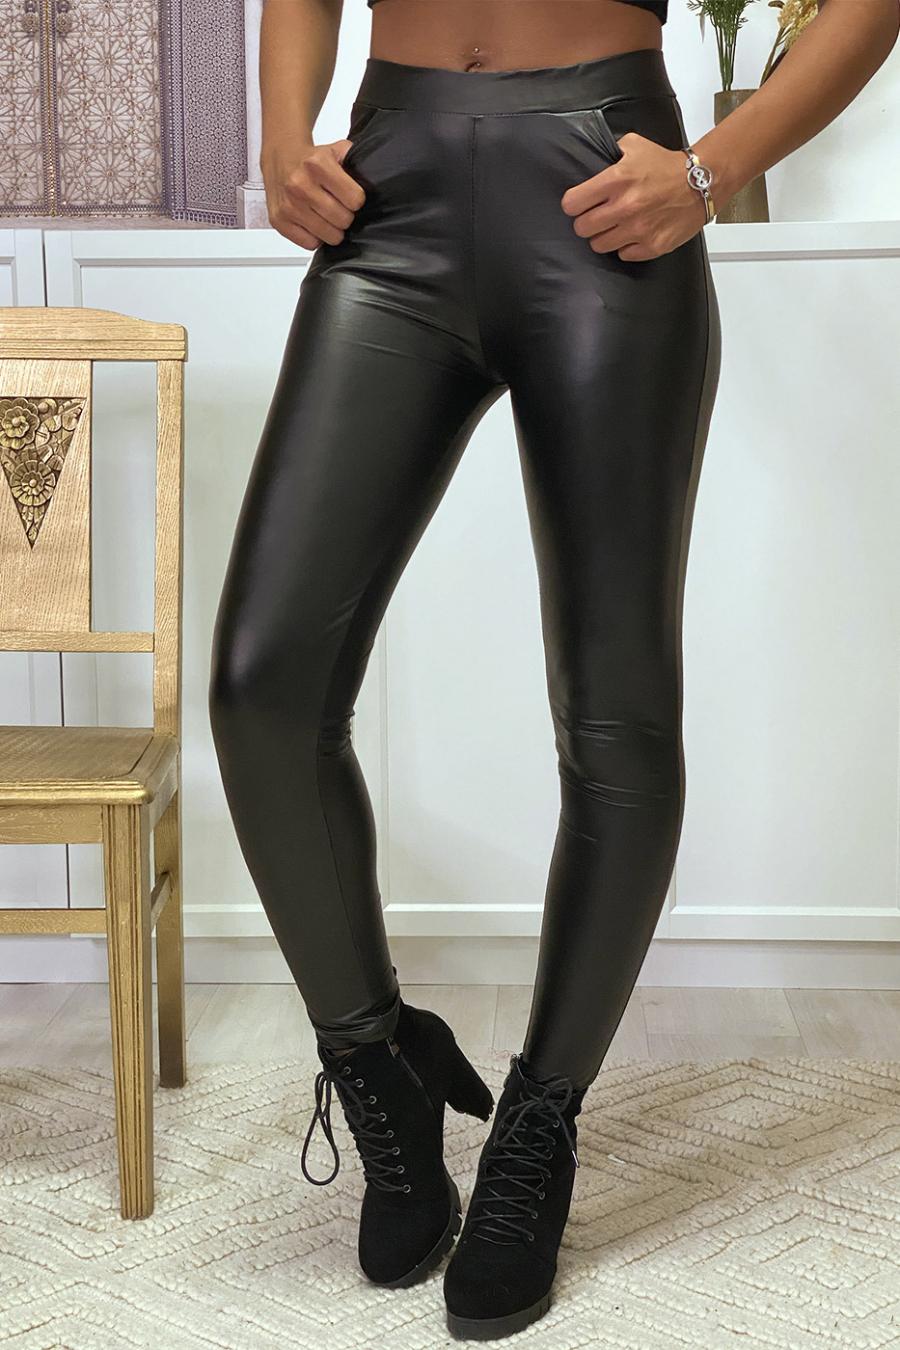 Black faux oil leggings with front and back pocket Leggings. Trend. ENLEG-9910